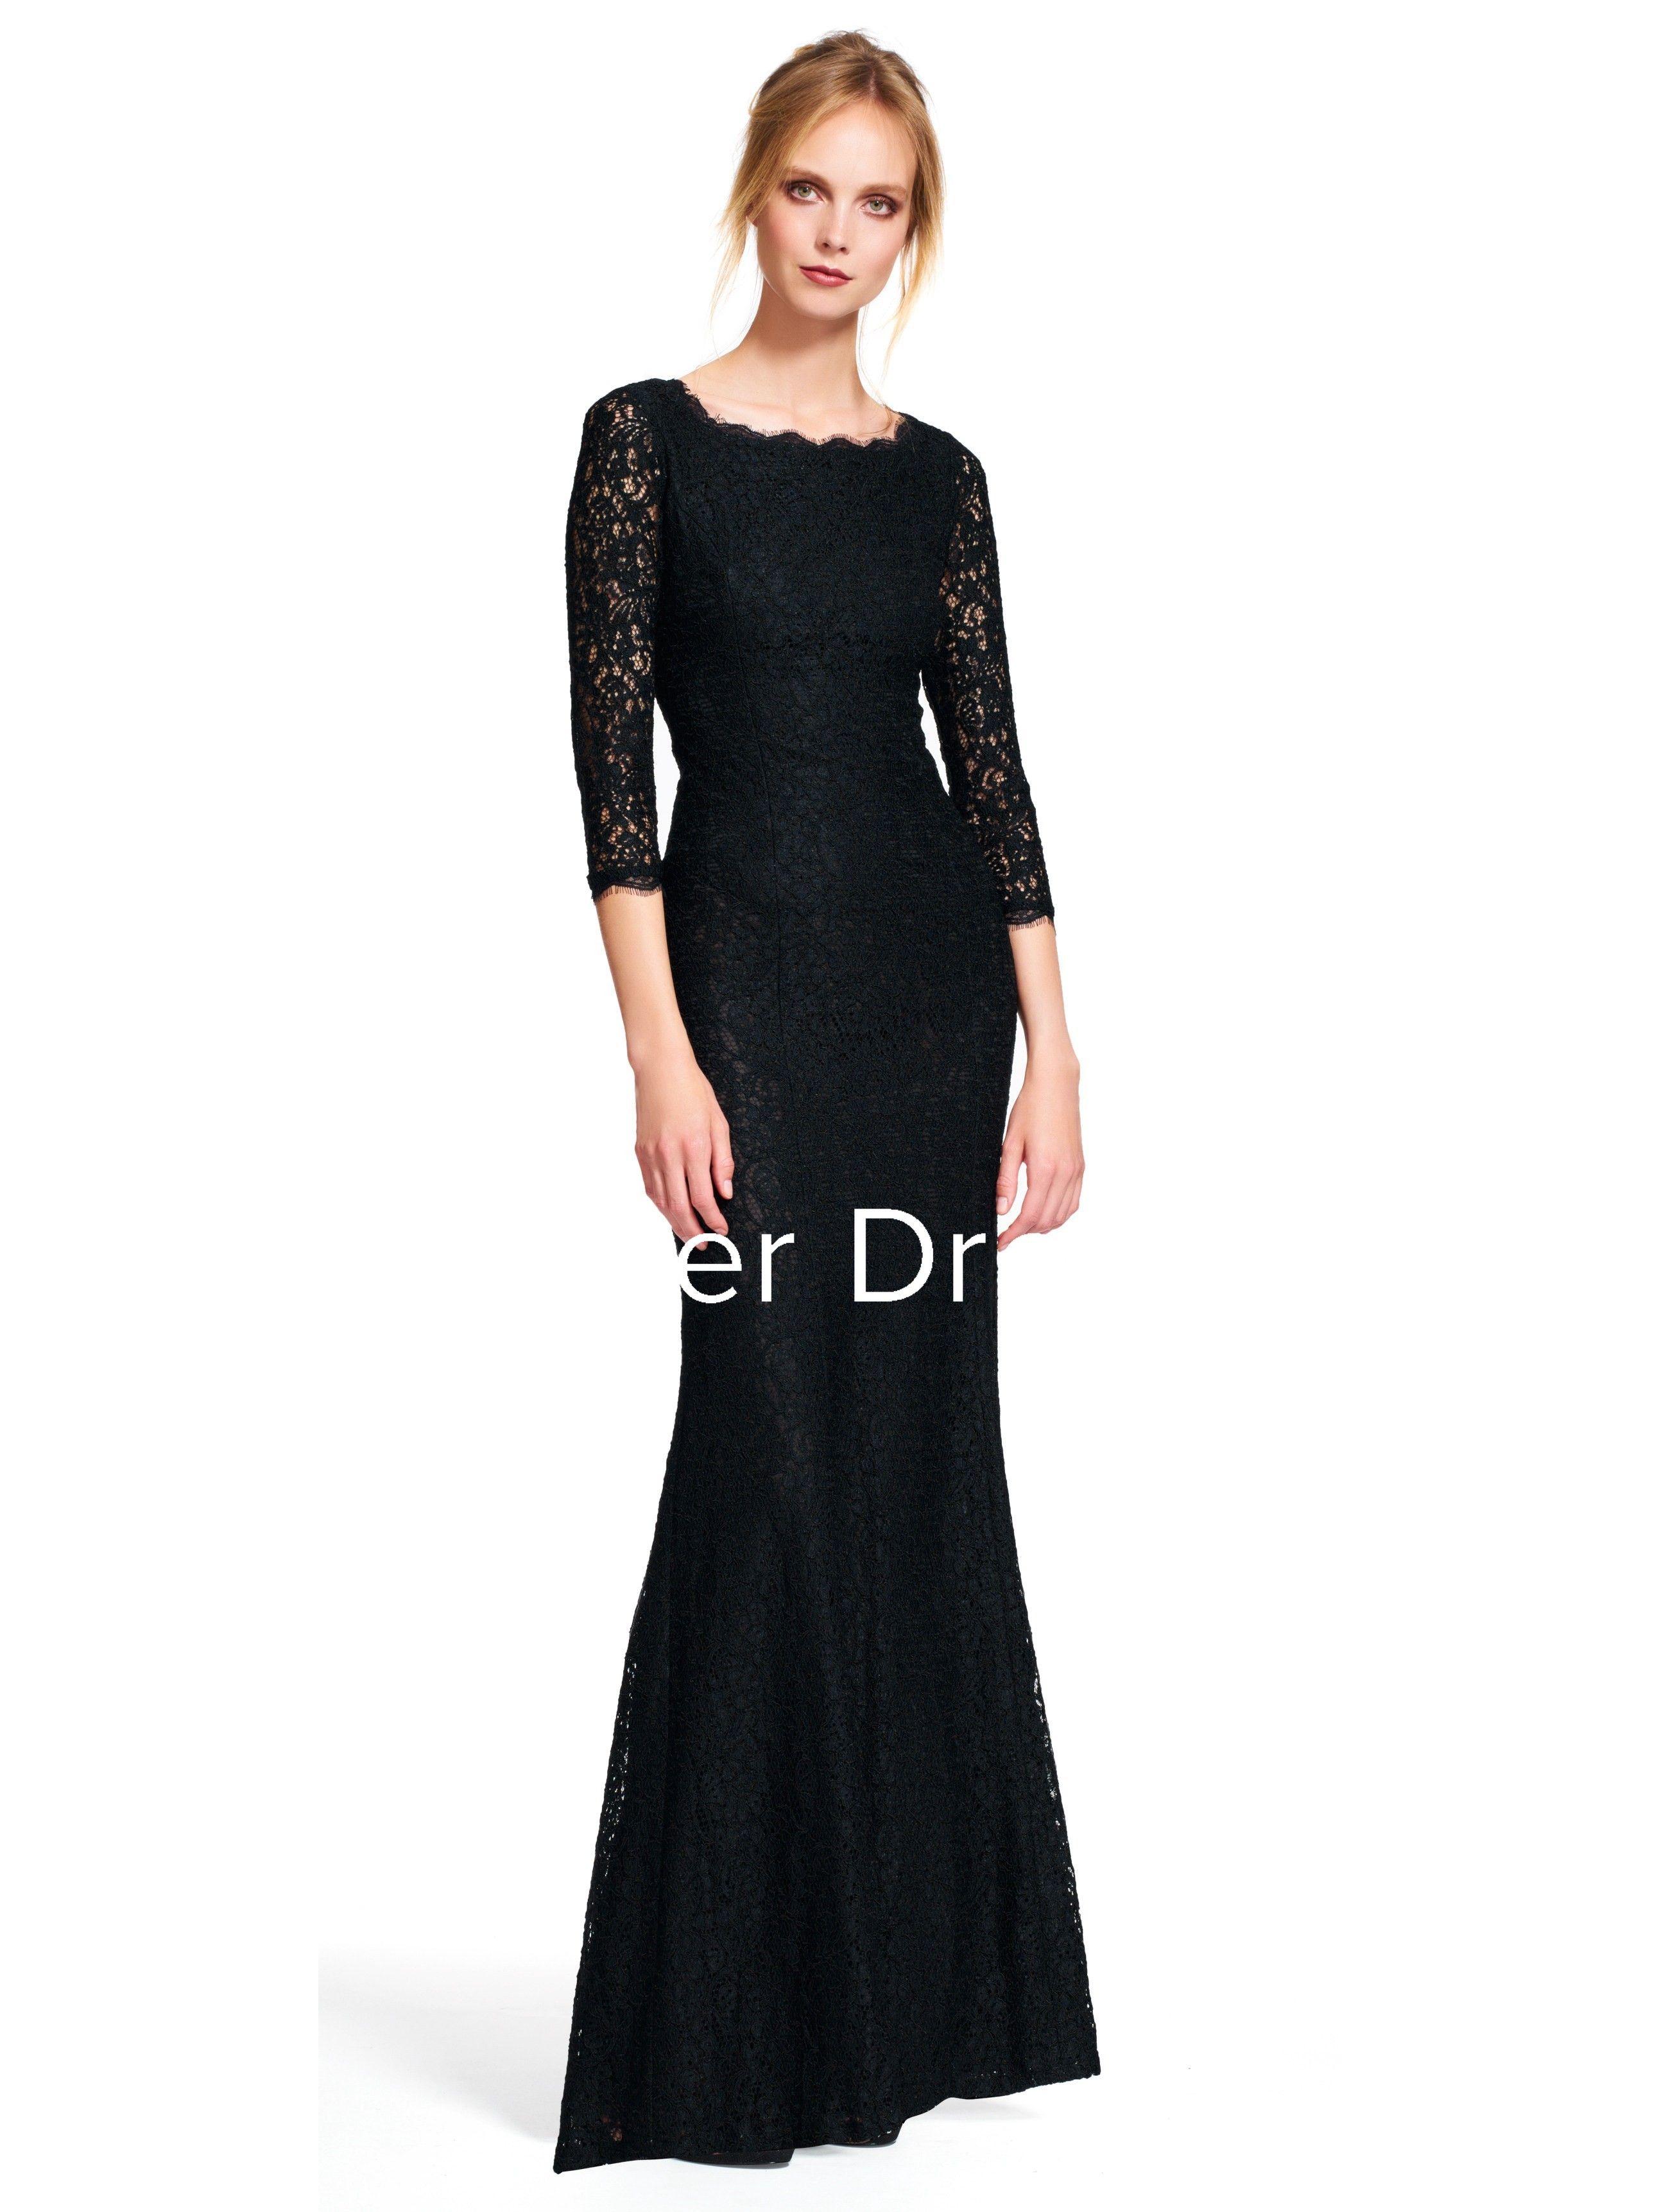 Sheath Floor Length 3 4 Sleeve Bateau Neck Lace Bridesmaid Dress Black Bridesmaid Dresses Long Lace Dress Long Long Sleeve Bridesmaid Dress